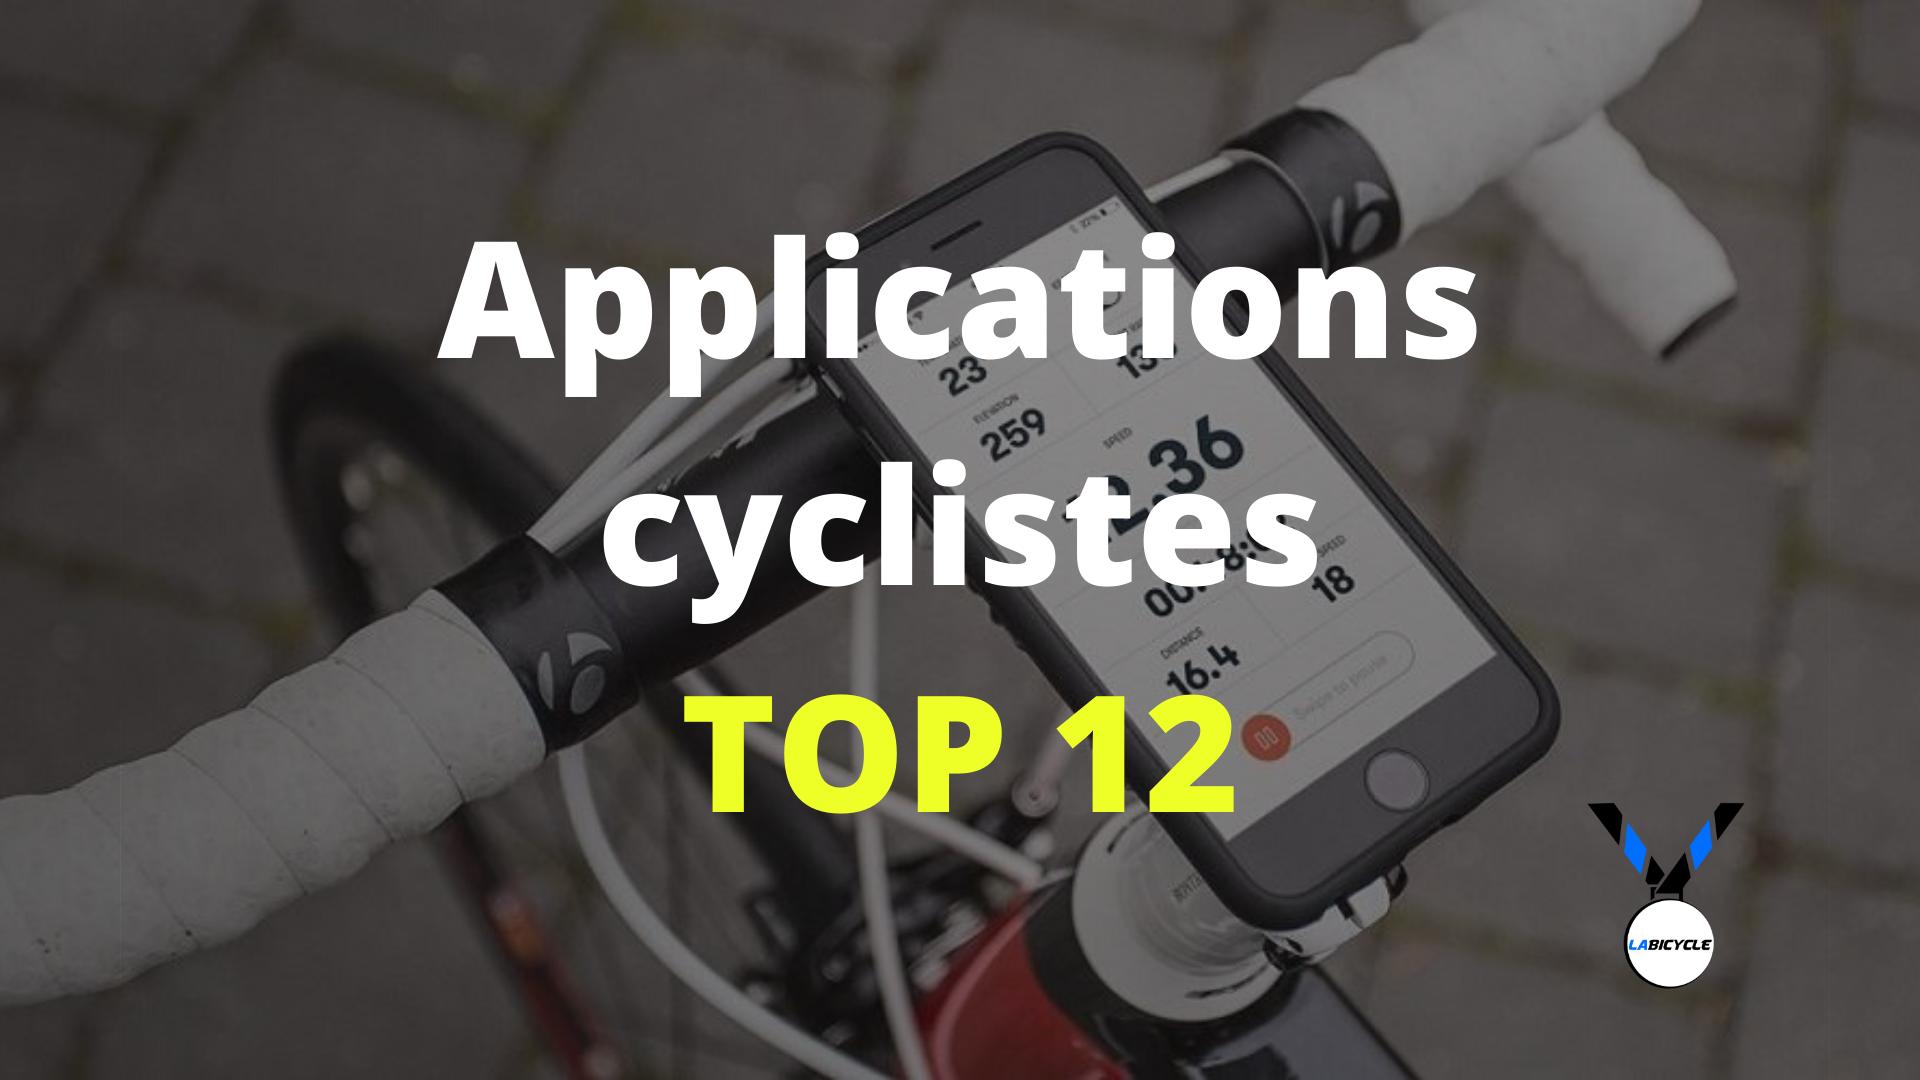 Les meilleures applications cyclistes